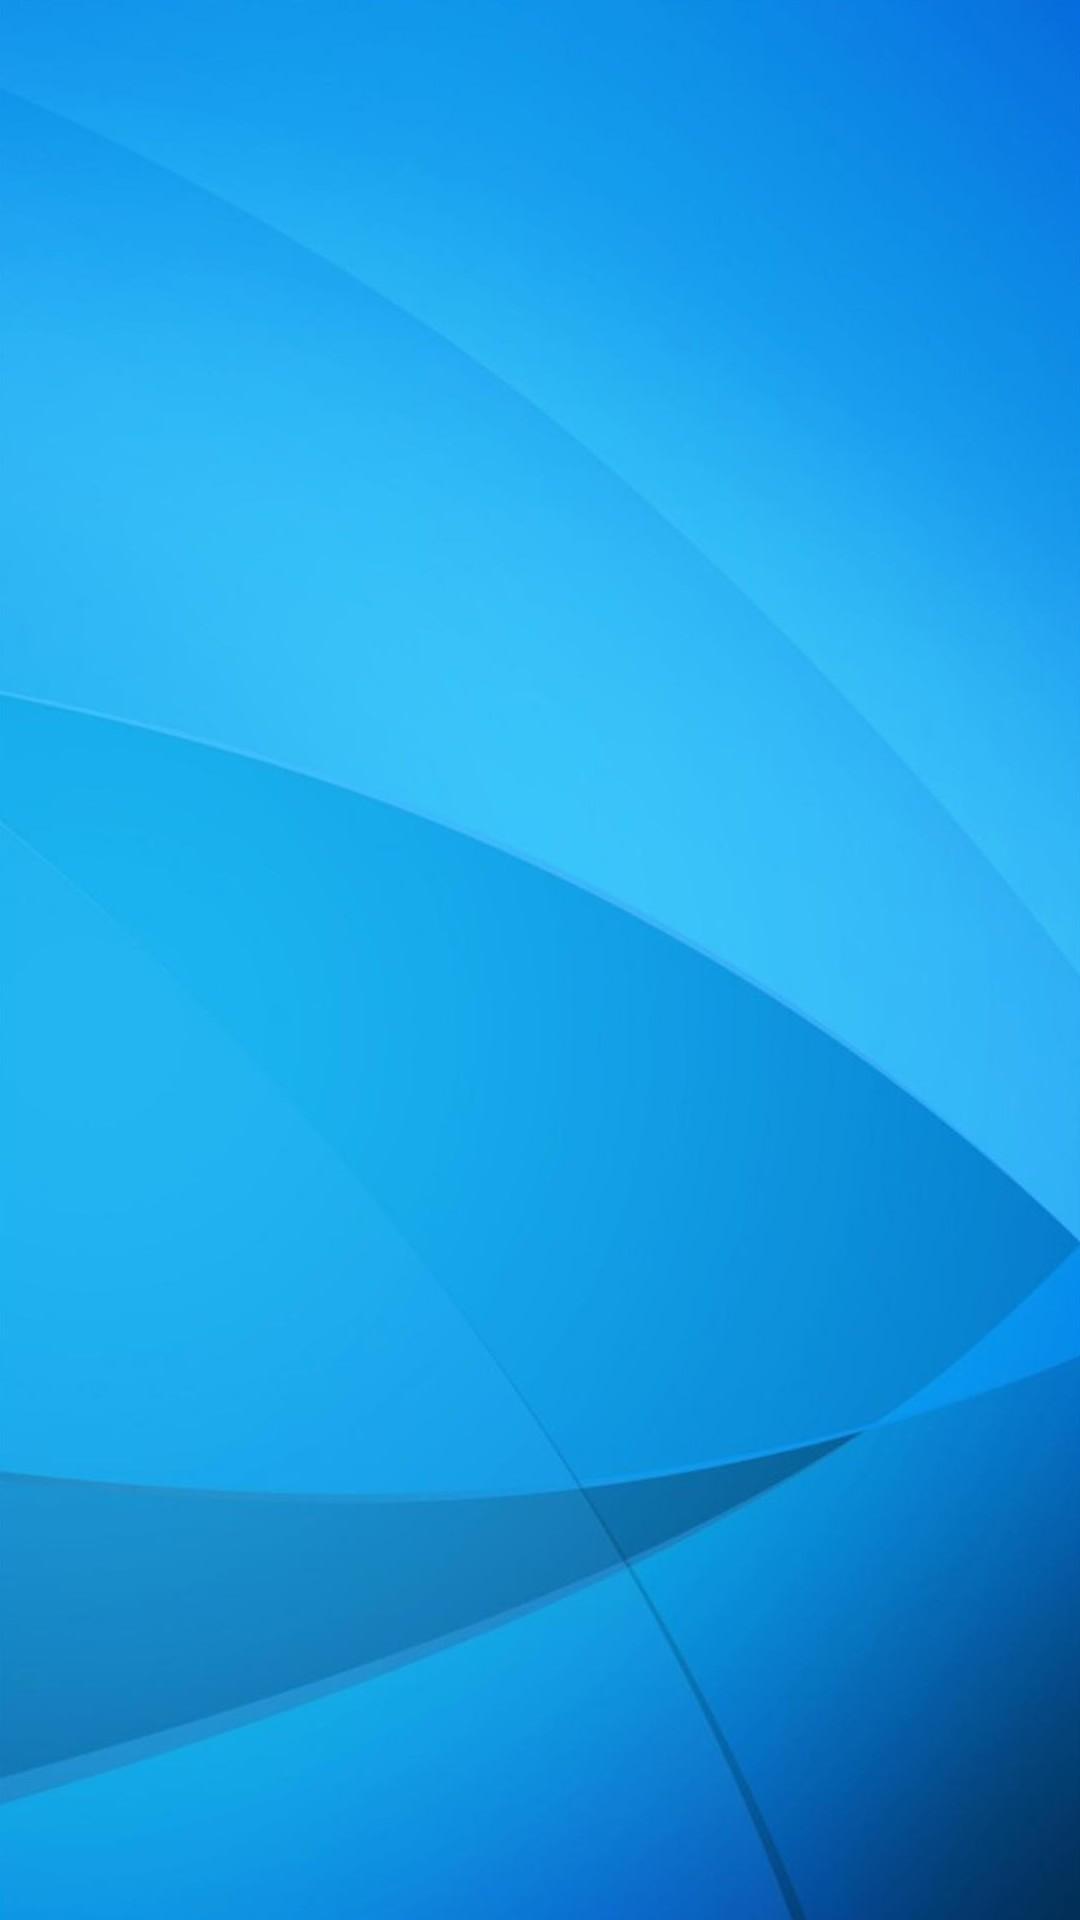 Free Download Samsung Galaxy Note 3 Wallpapers 342 Samsung Galaxy